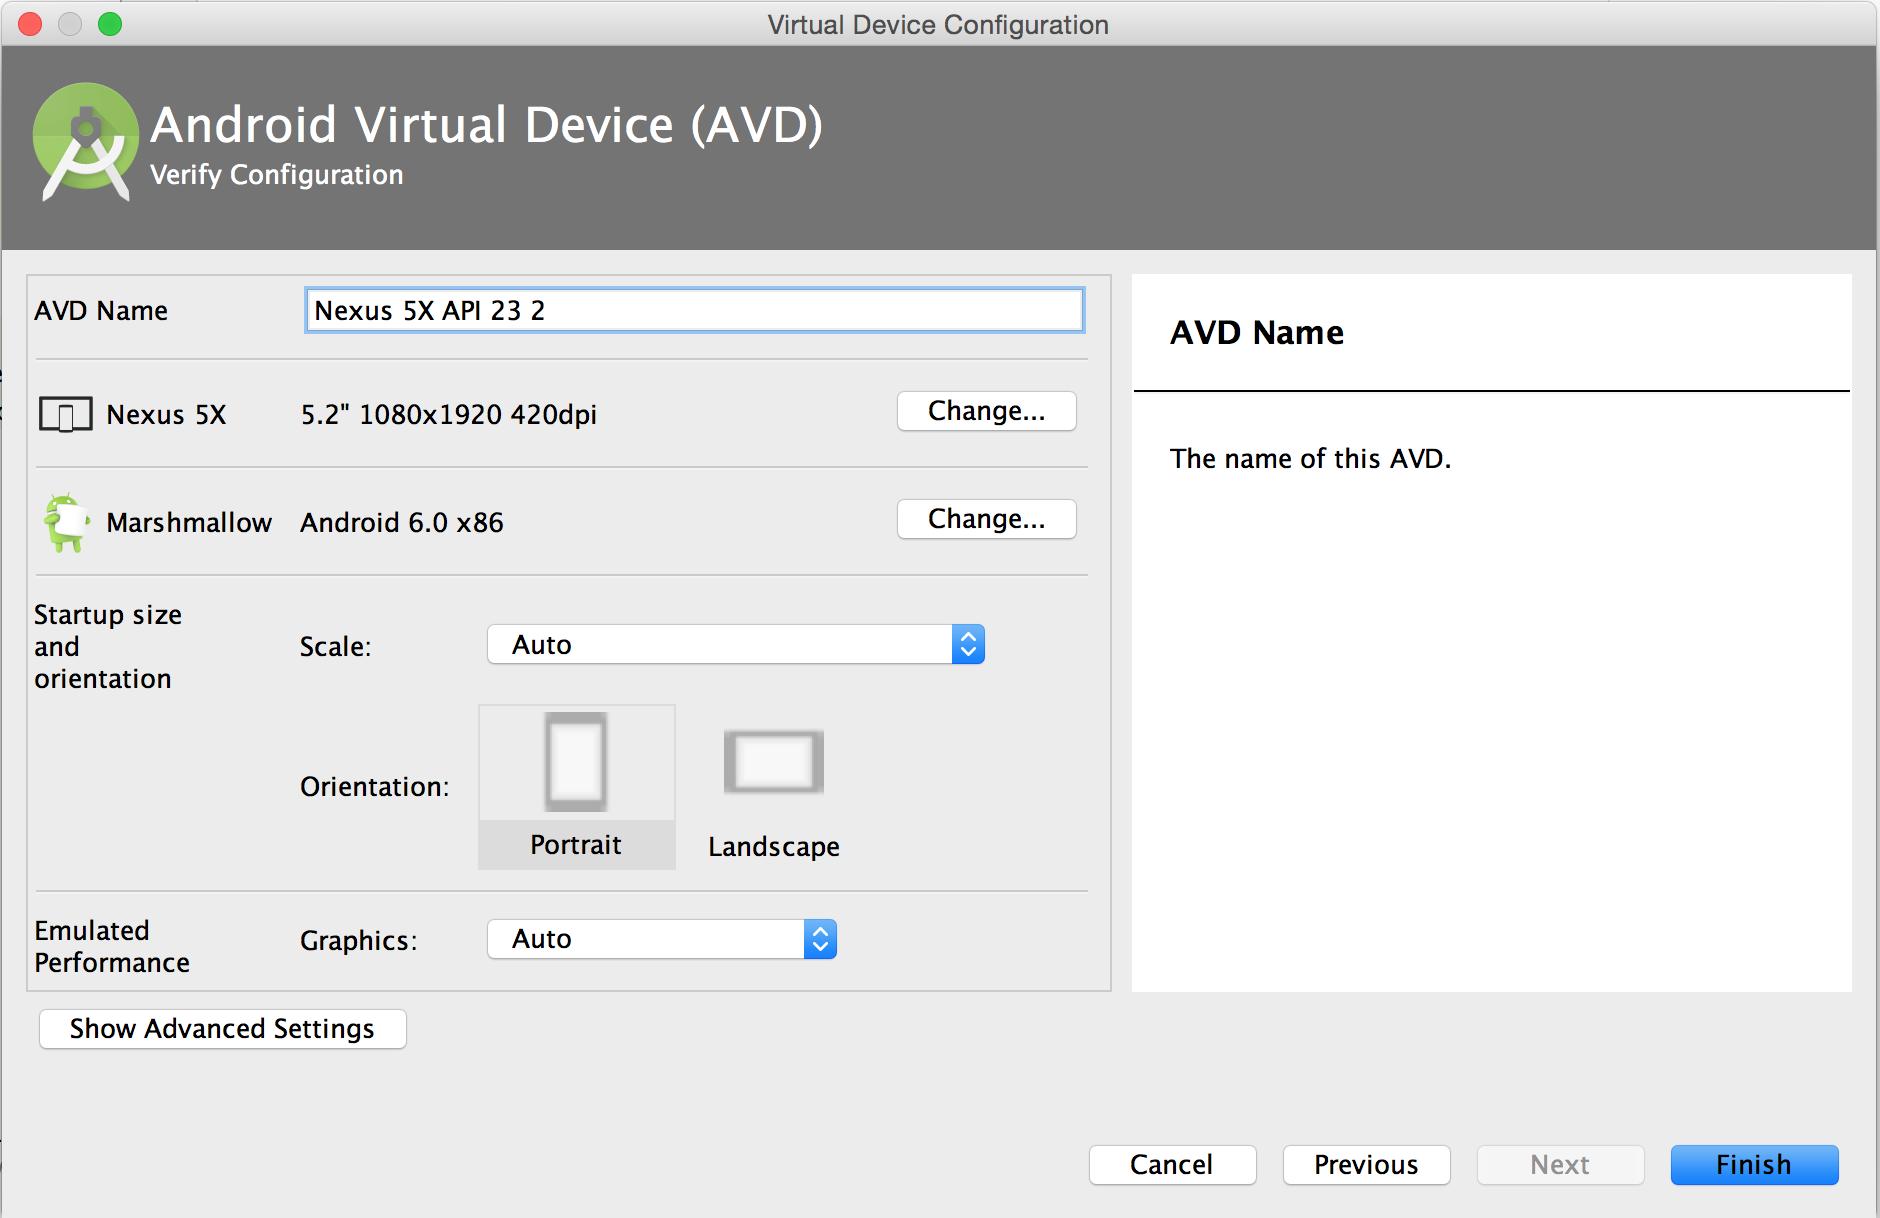 Laman Verify Configuration dari AVD Manager